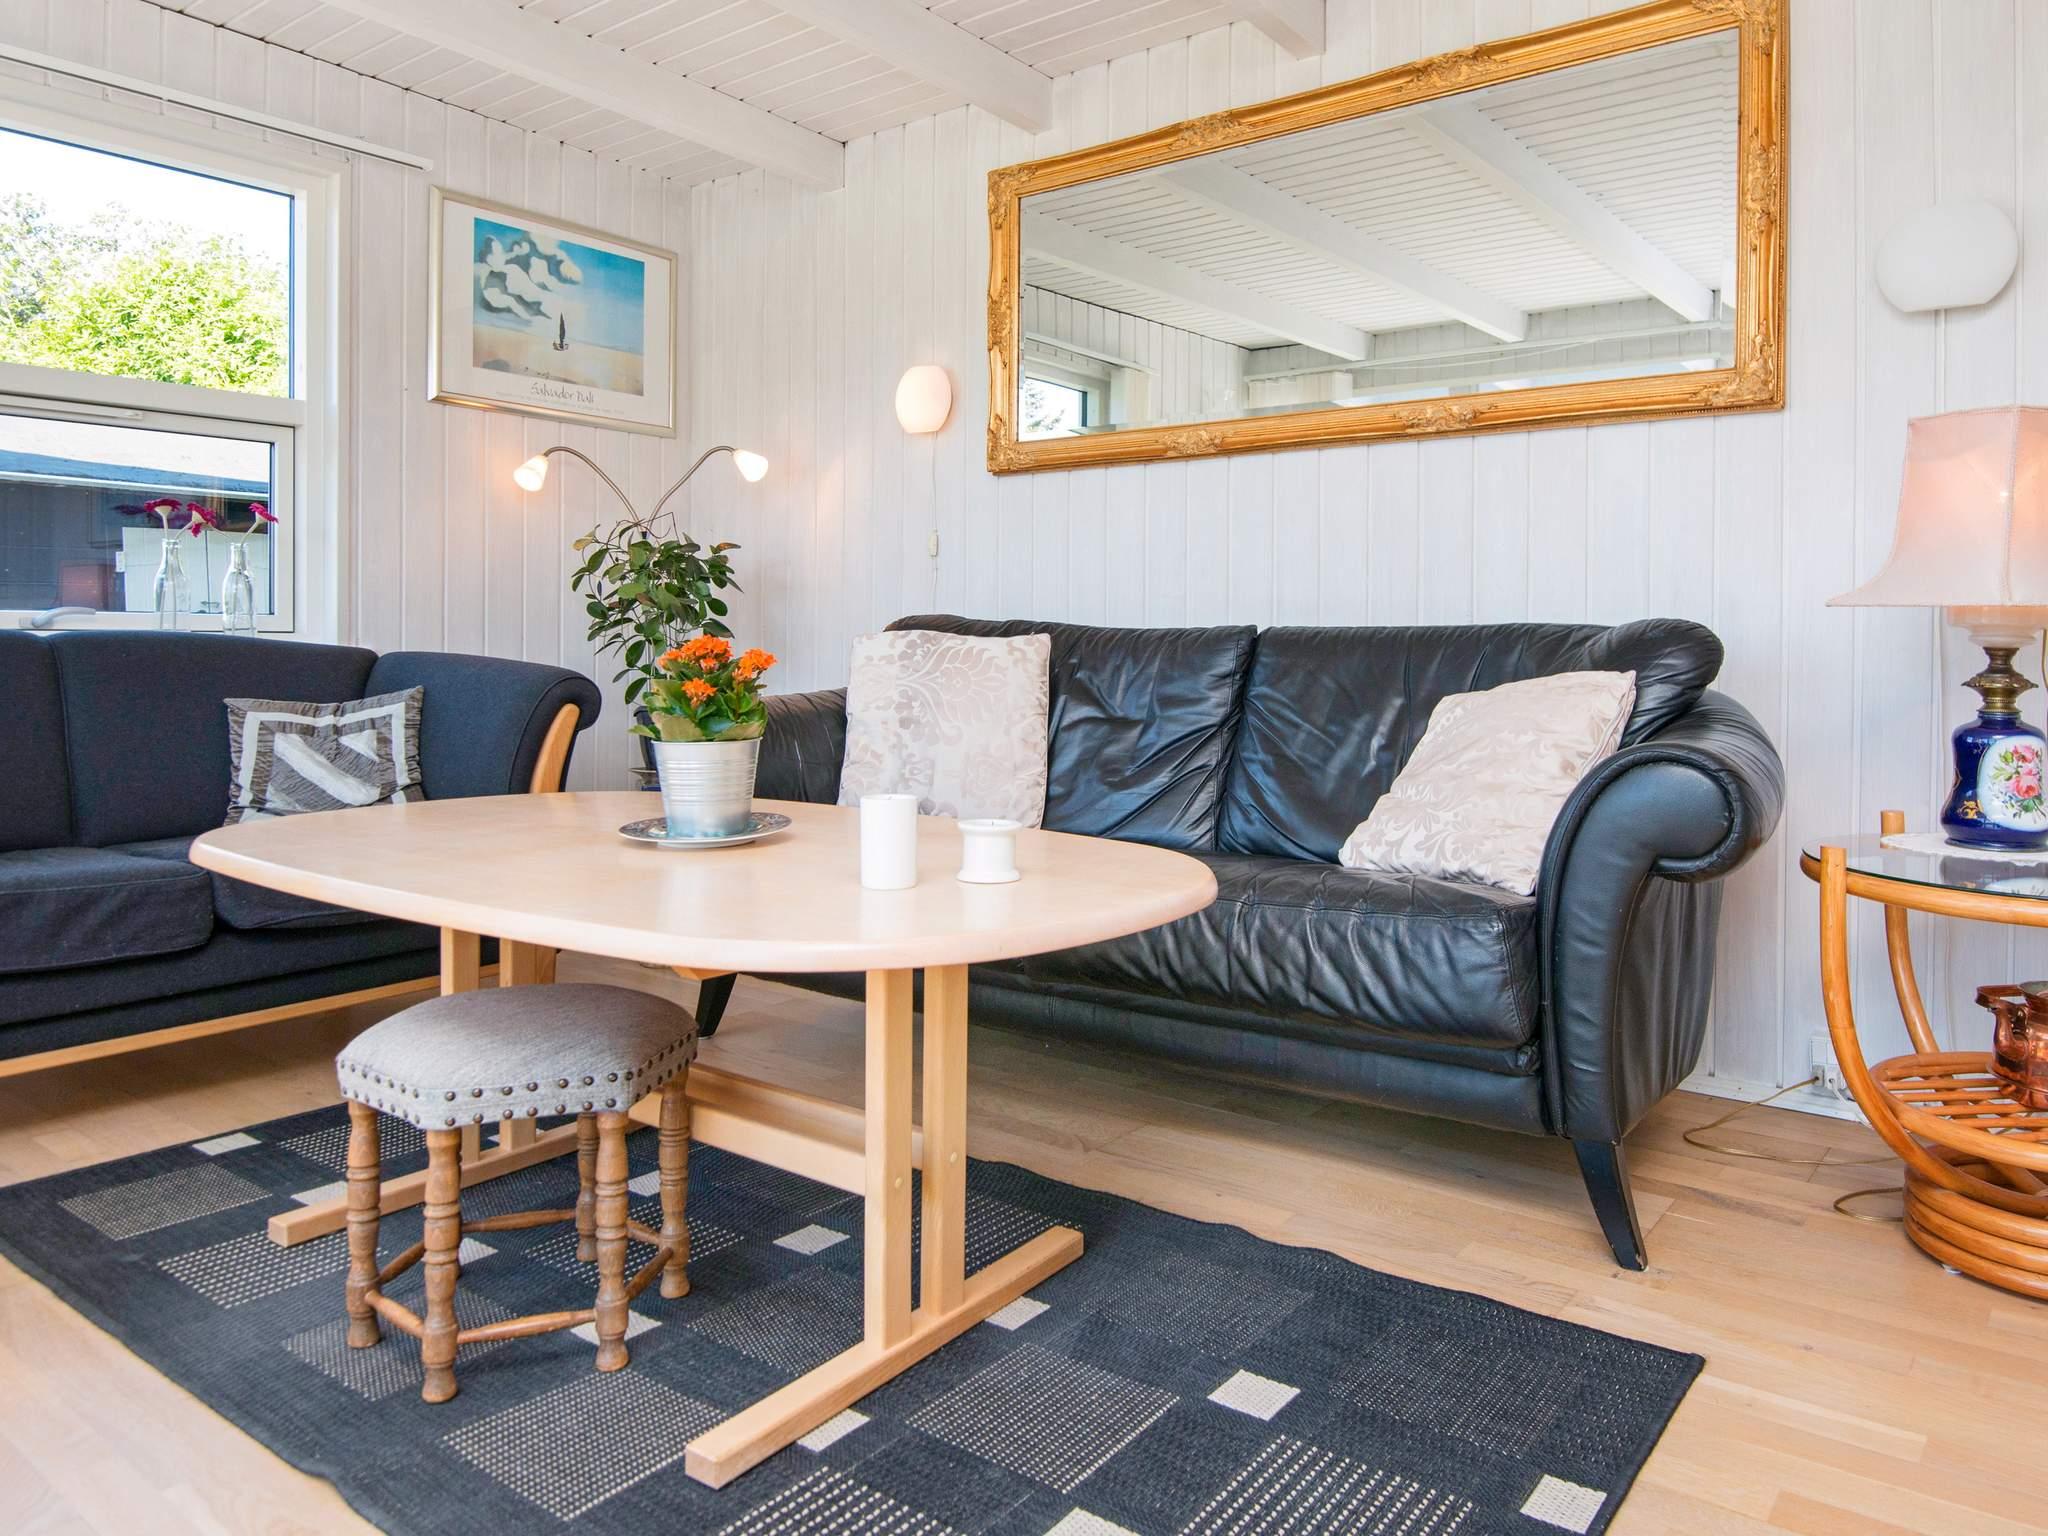 Ferienhaus Lyngsbæk Strand (493402), Ebeltoft, , Ostjütland, Dänemark, Bild 2